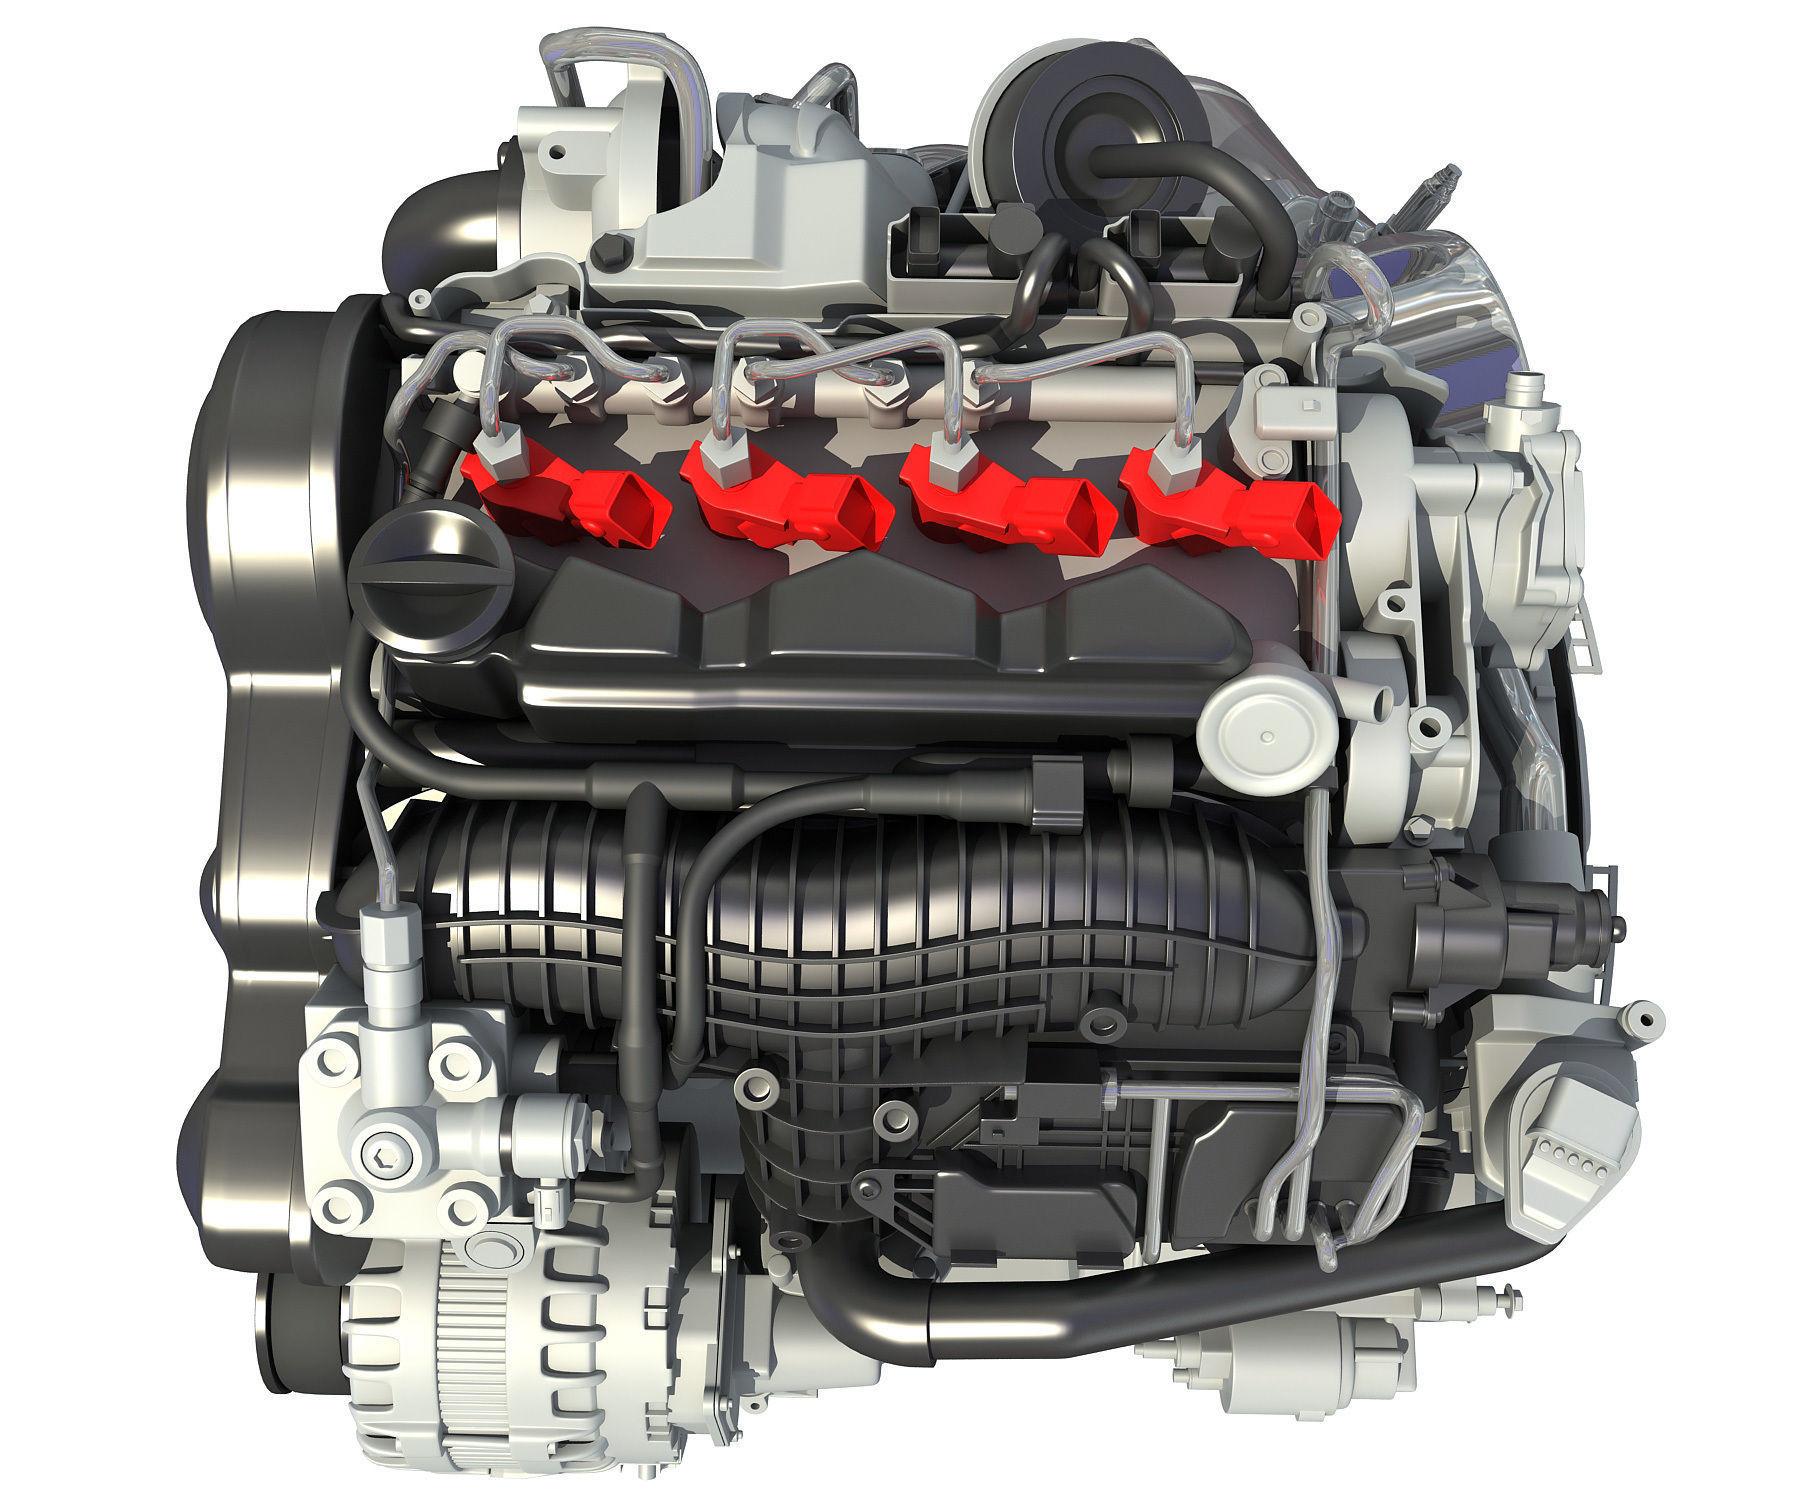 3D Engine Models - Car